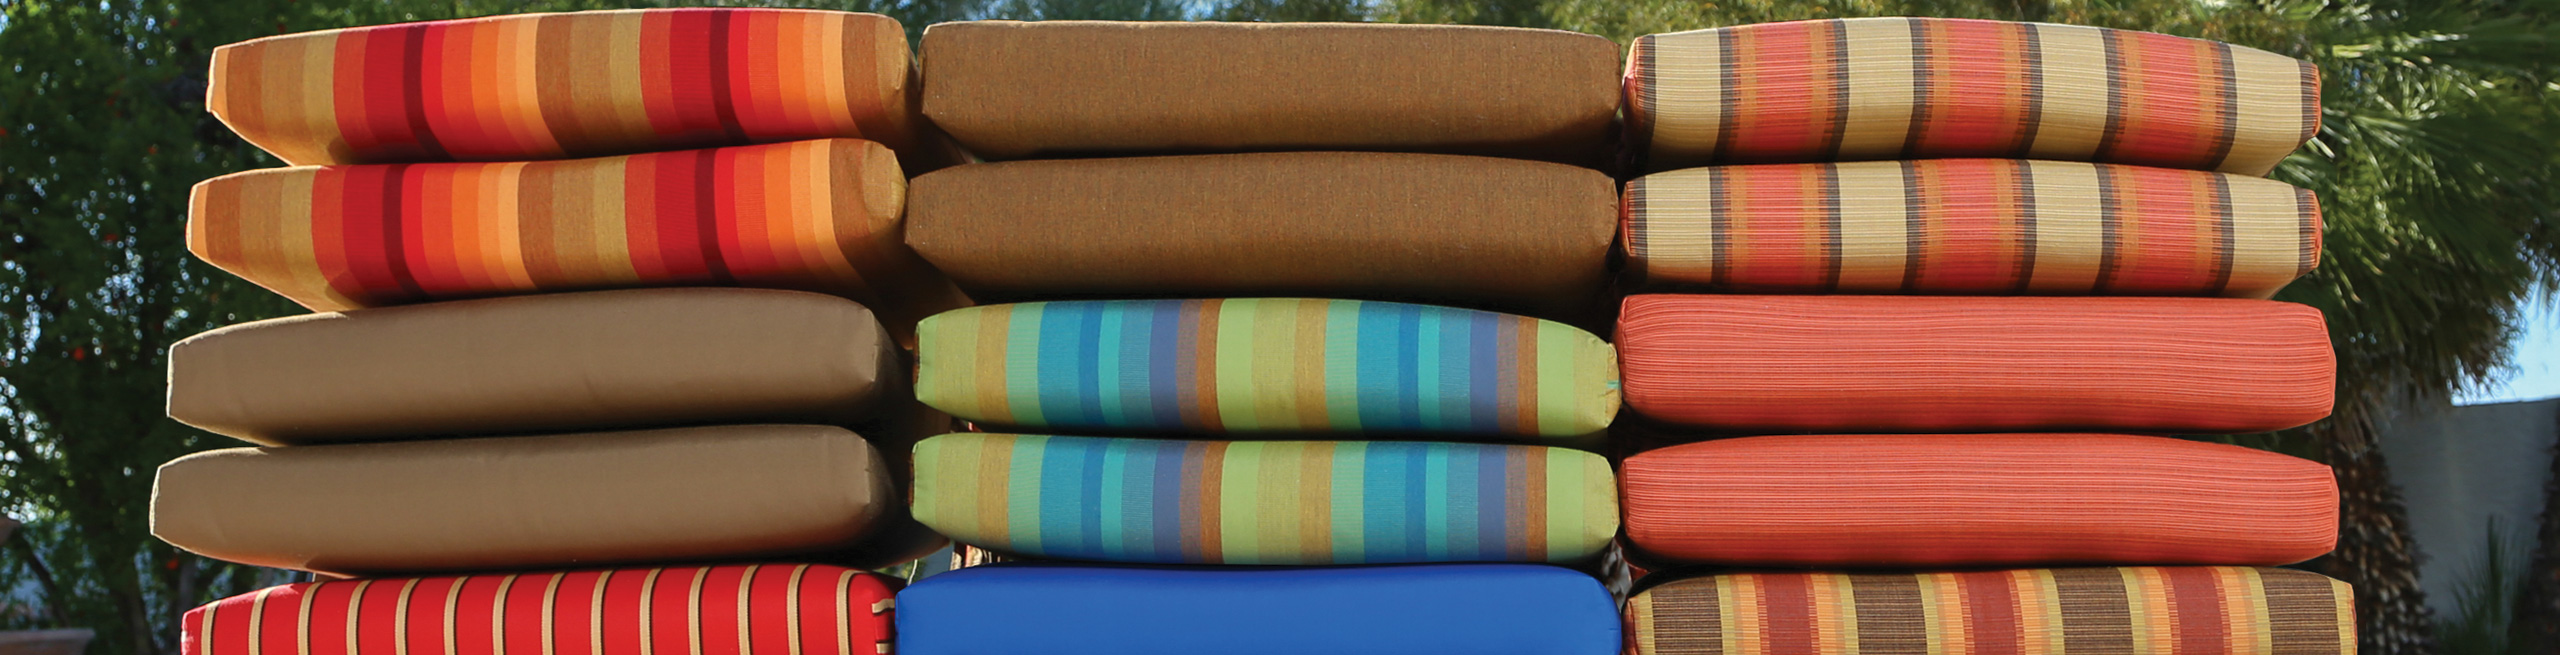 patio cushions outdoor cushions FBVRMSB